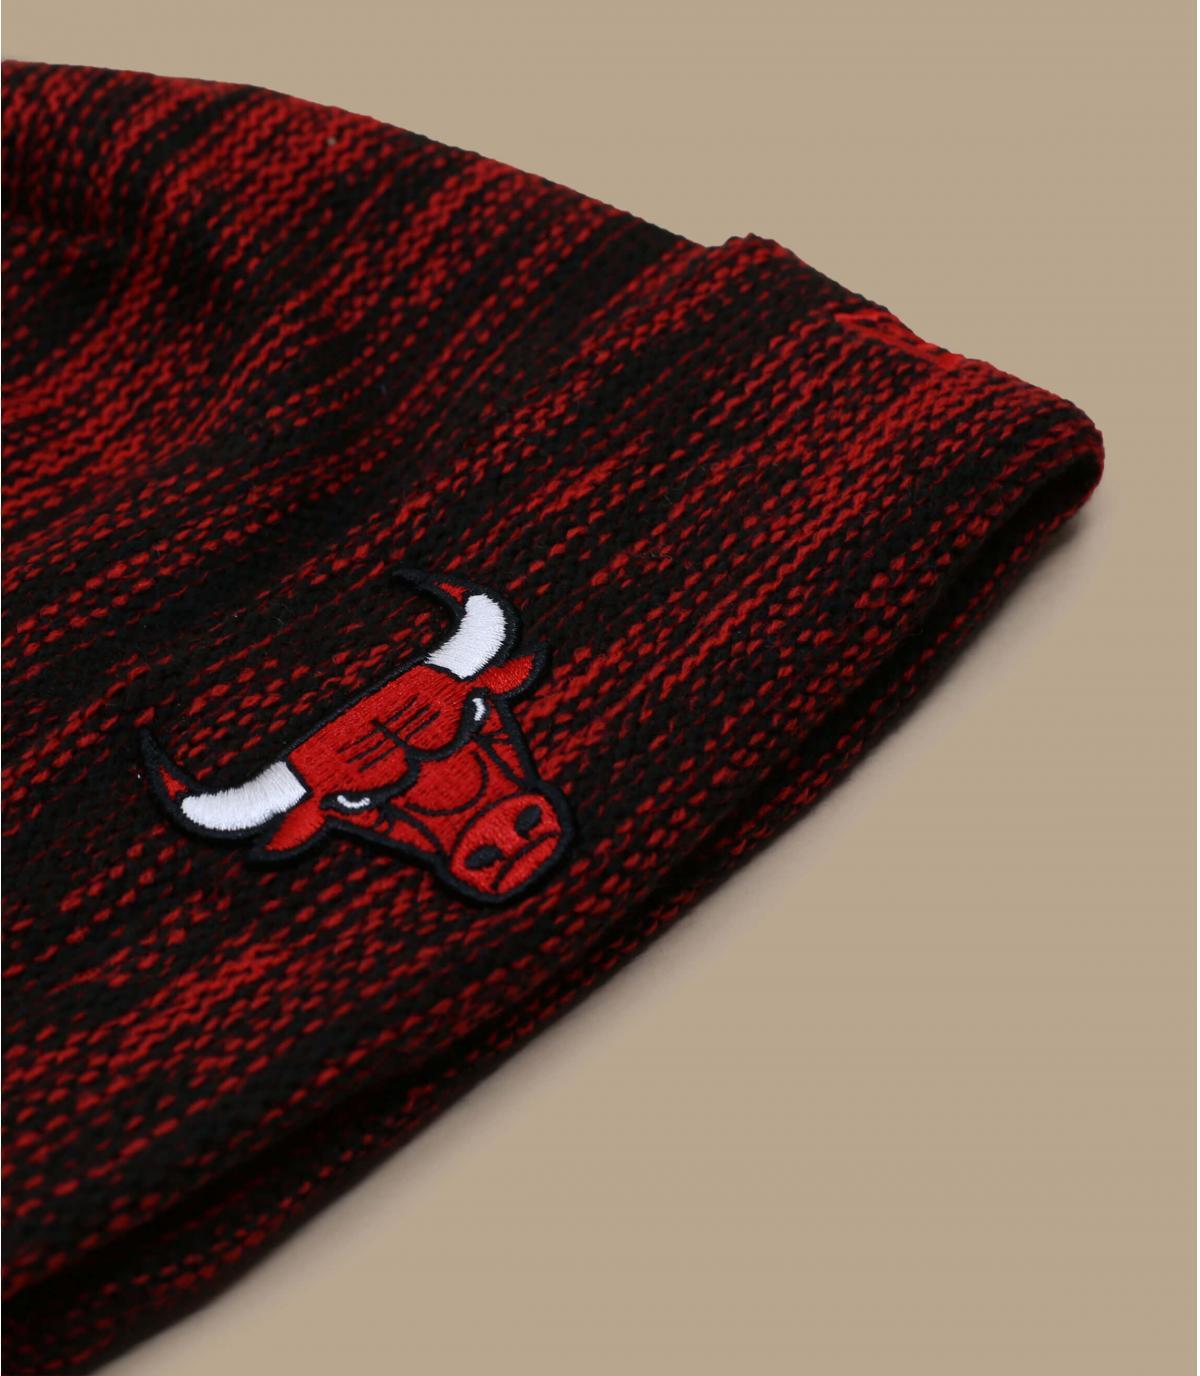 Details Mütze Kids Bulls Marl black red - Abbildung 3